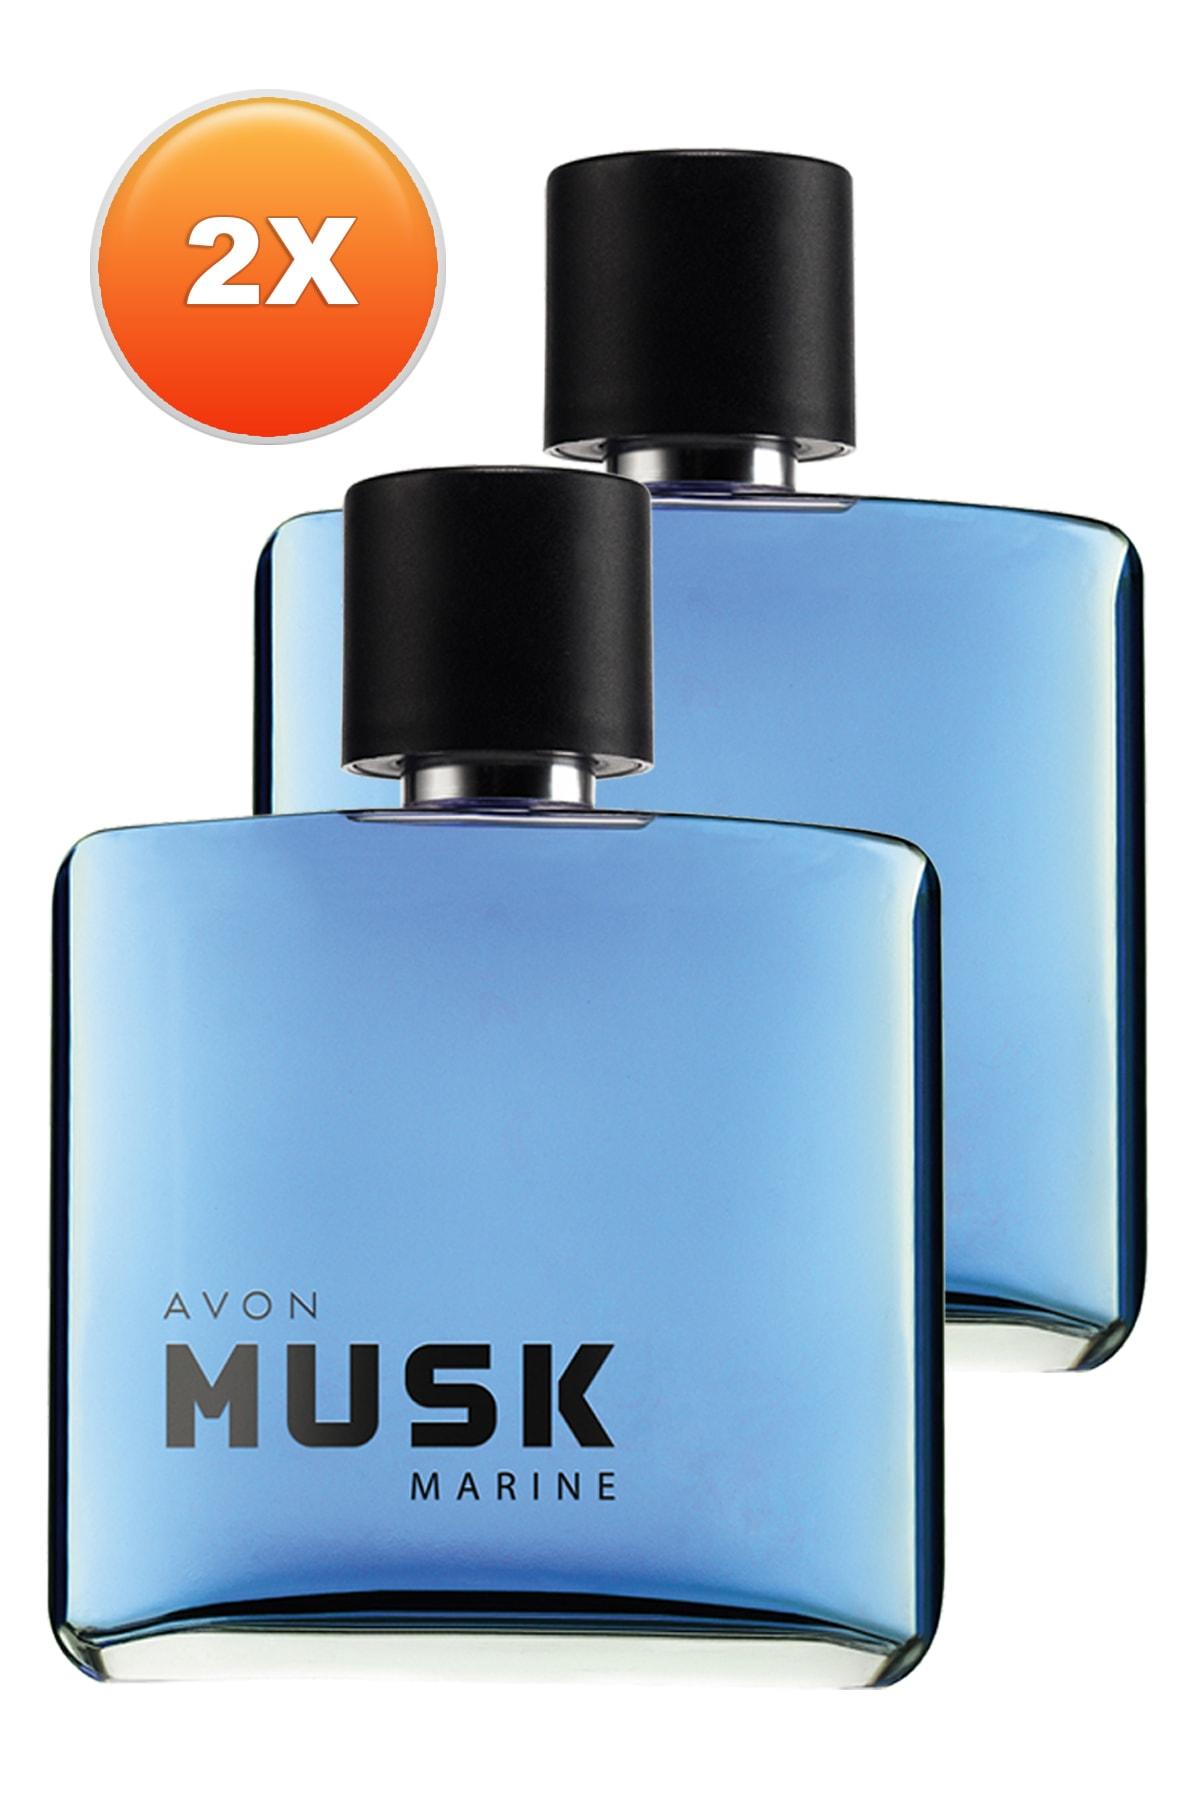 AVON Musk Marine Erkek Parfüm Edt 75 ml 2'li Set 5050000104852 1